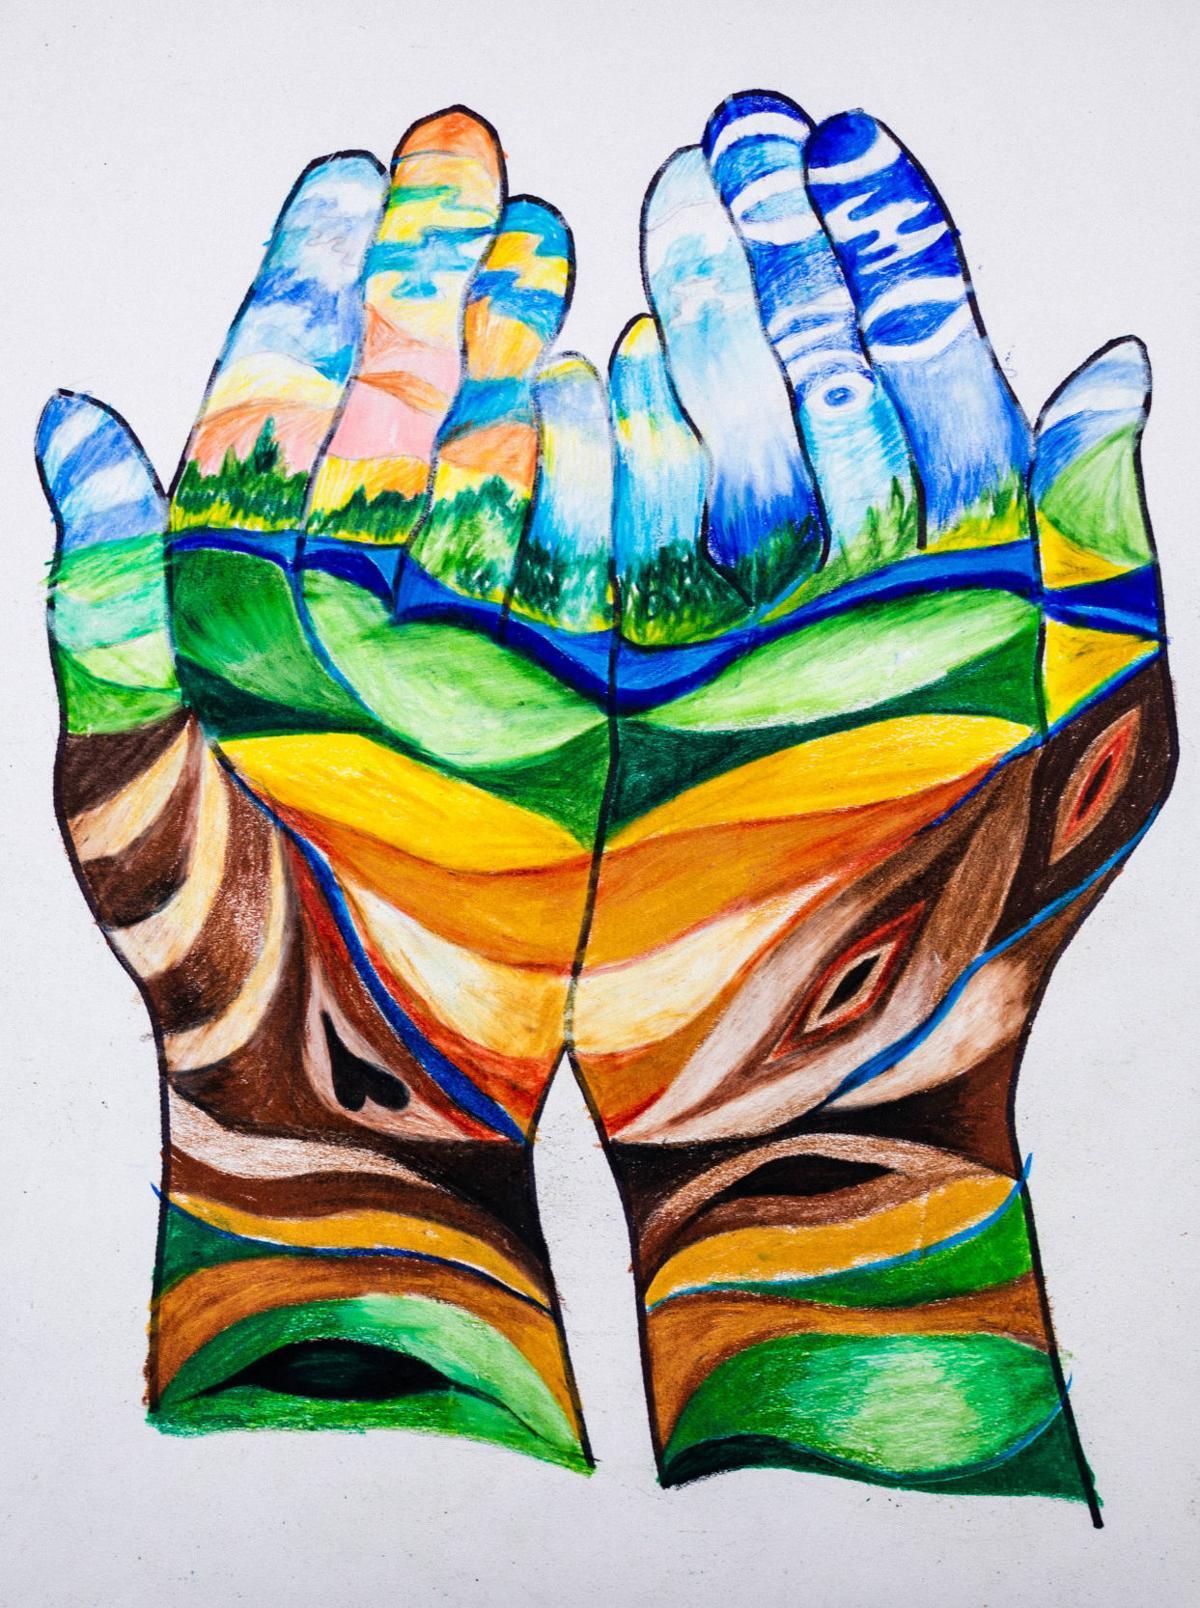 Handscape by Paula Yoachim